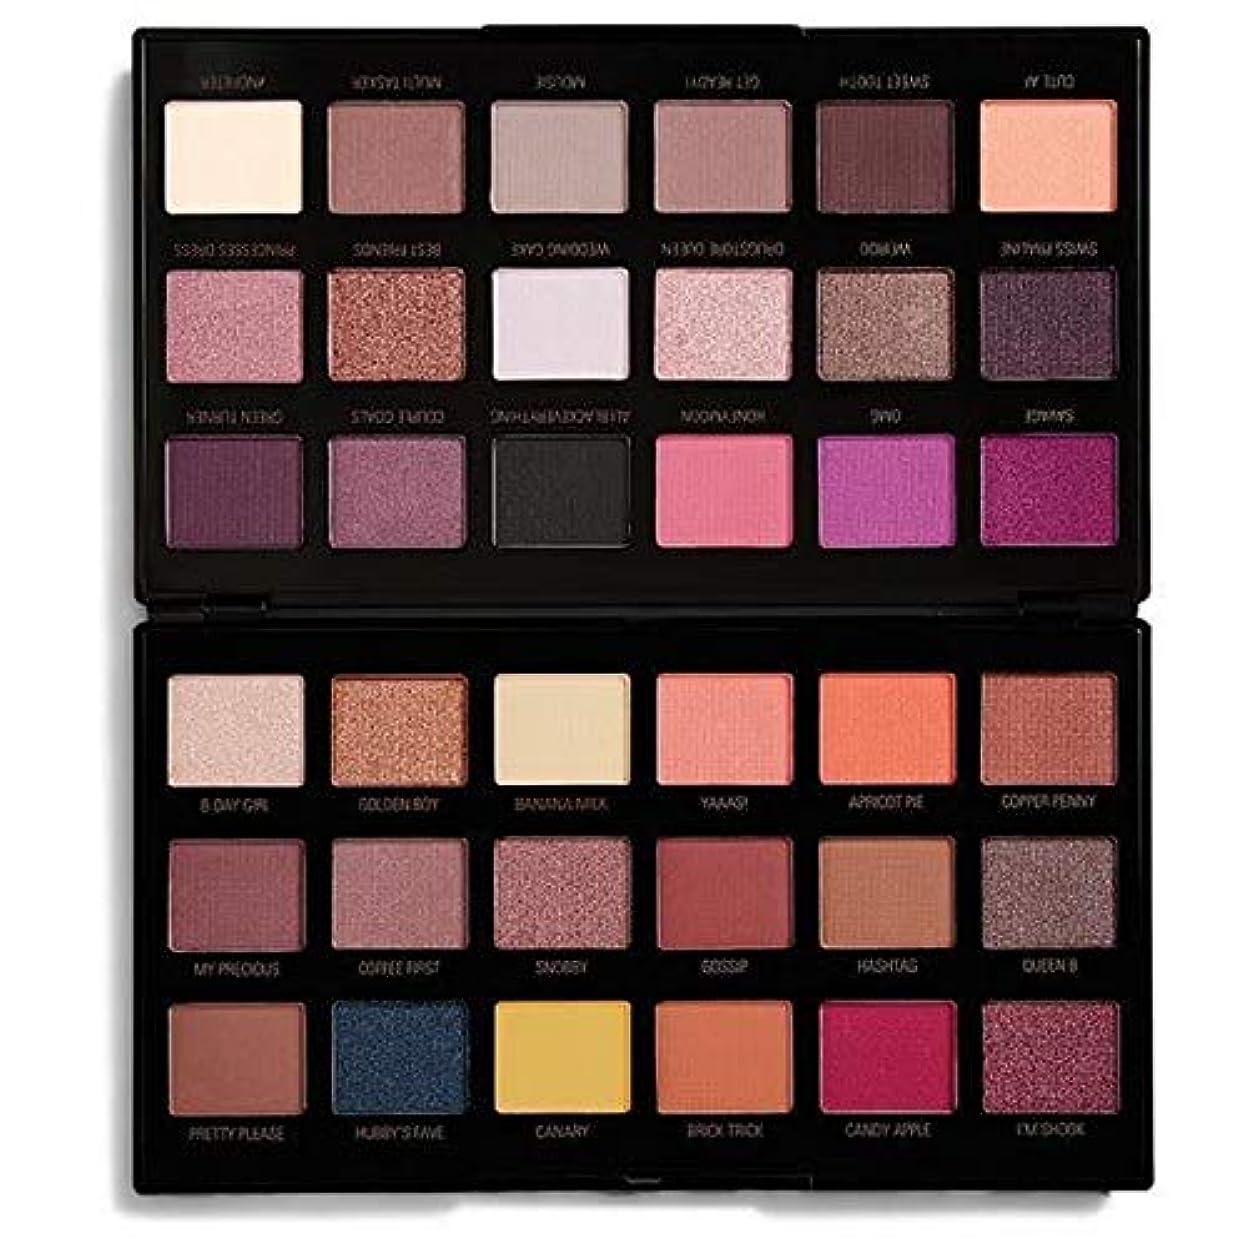 [Revolution ] 化粧革命のXペトラアイシャドウパレット - Makeup Revolution X Petra Eye Shadow Palette [並行輸入品]